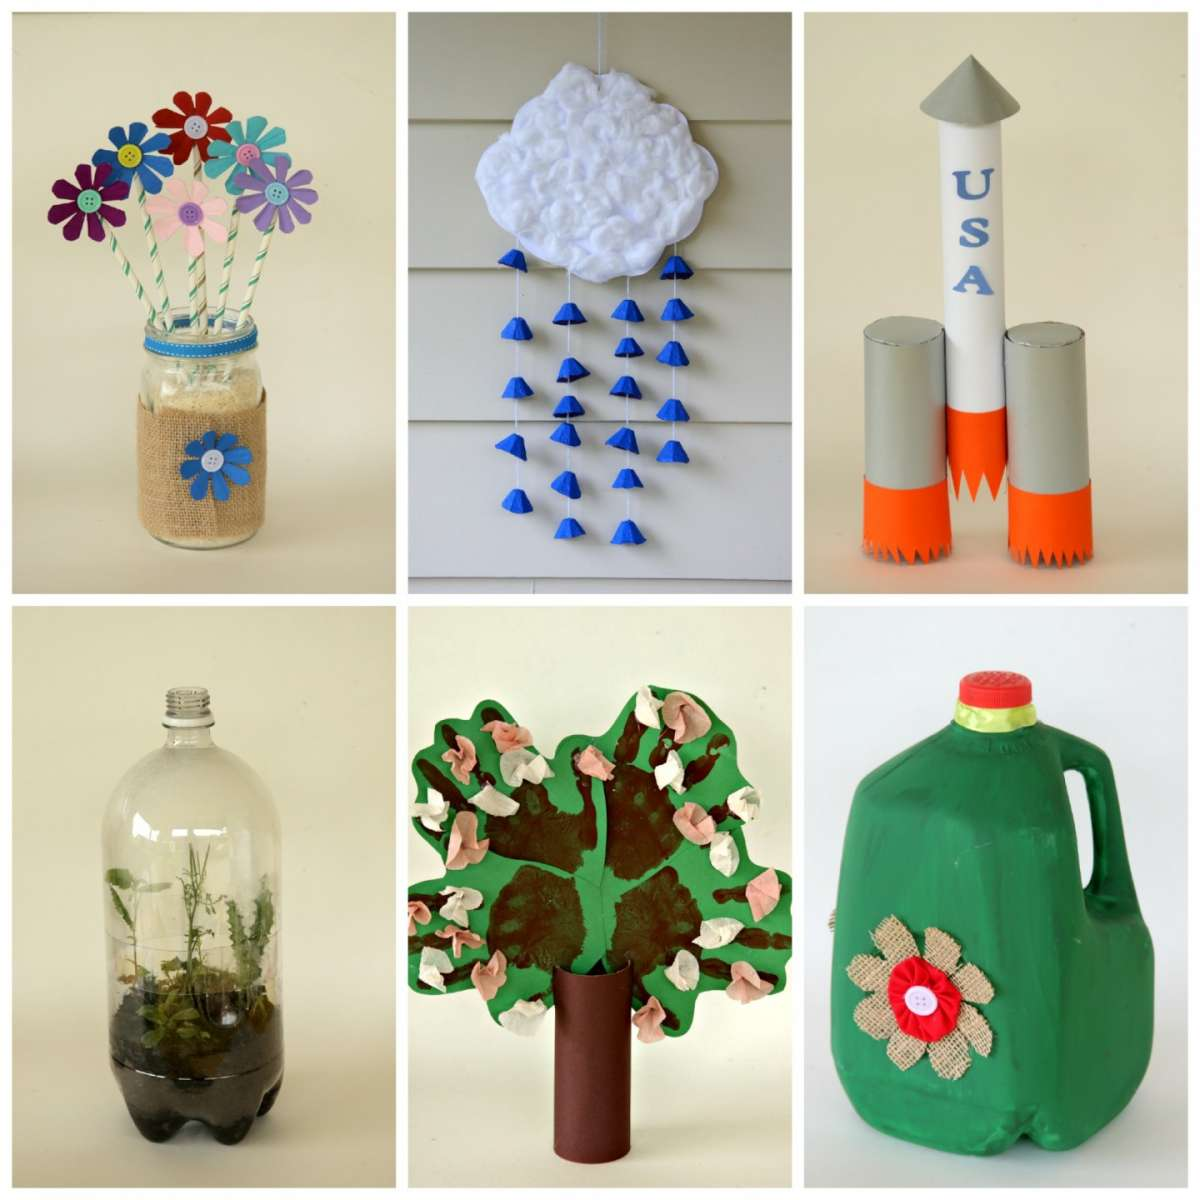 riciclo creativo dei flaconi idee creative